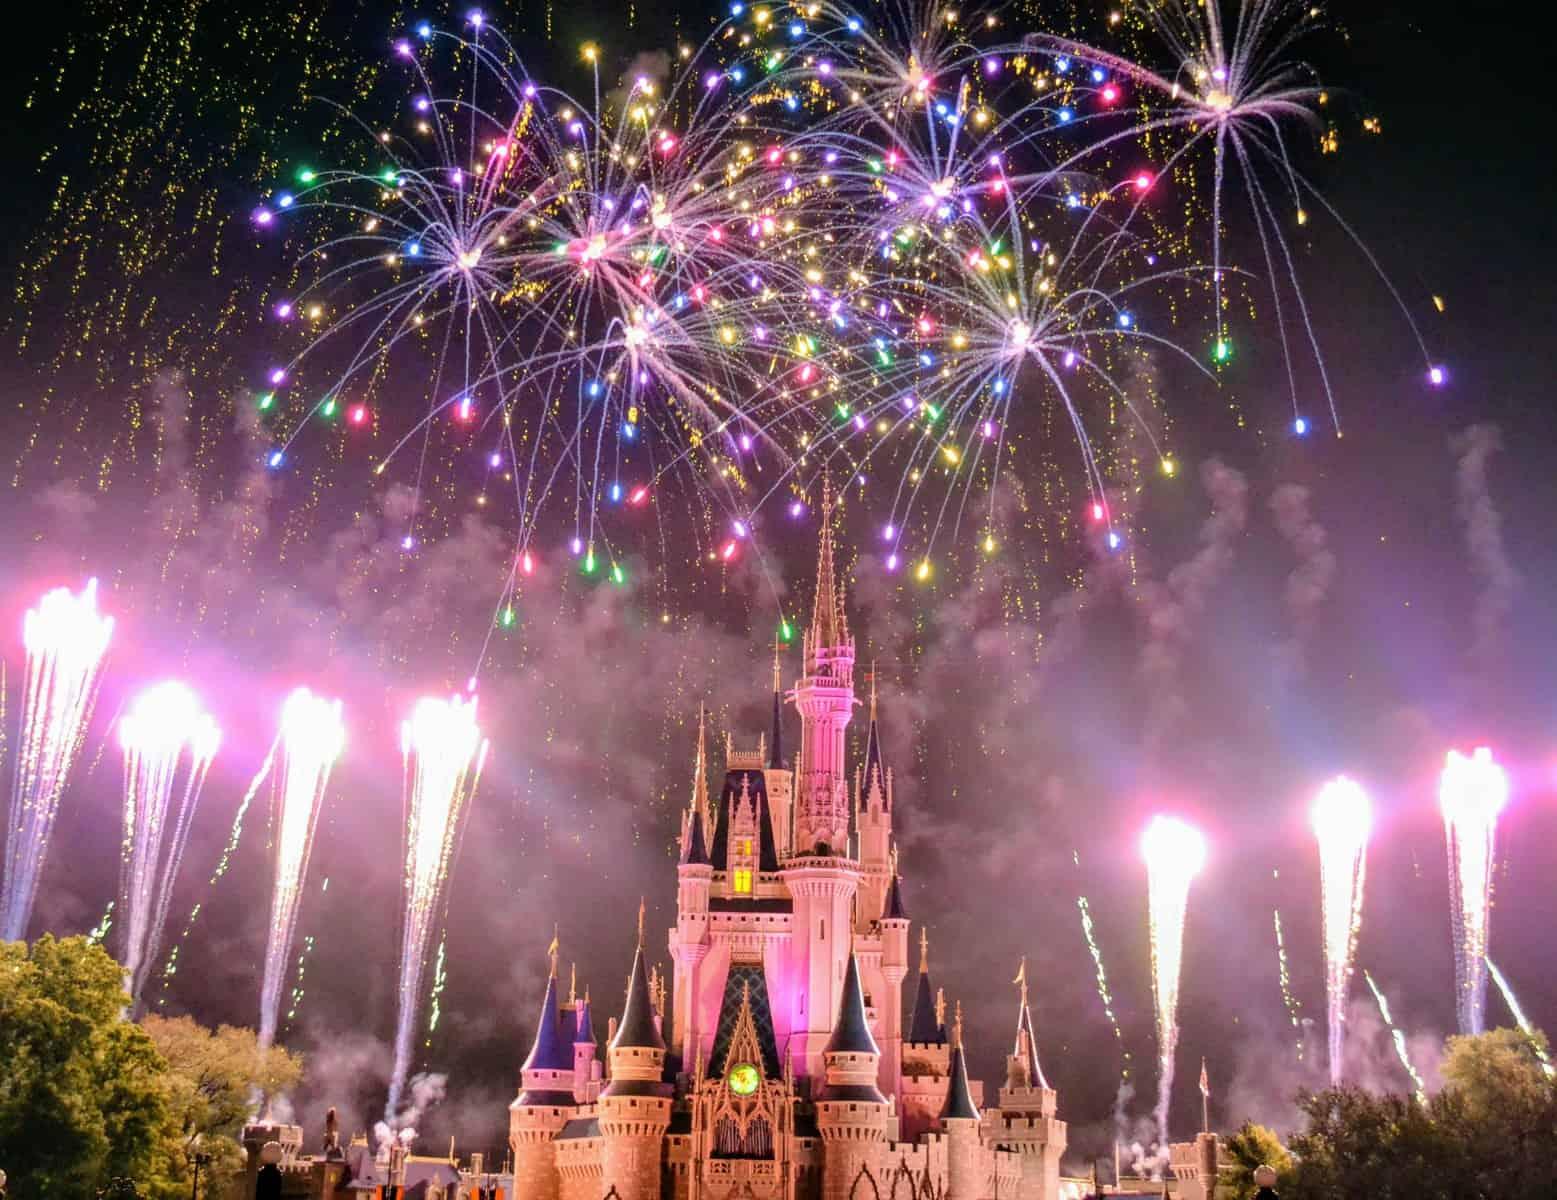 Cinderella Castle fireworks